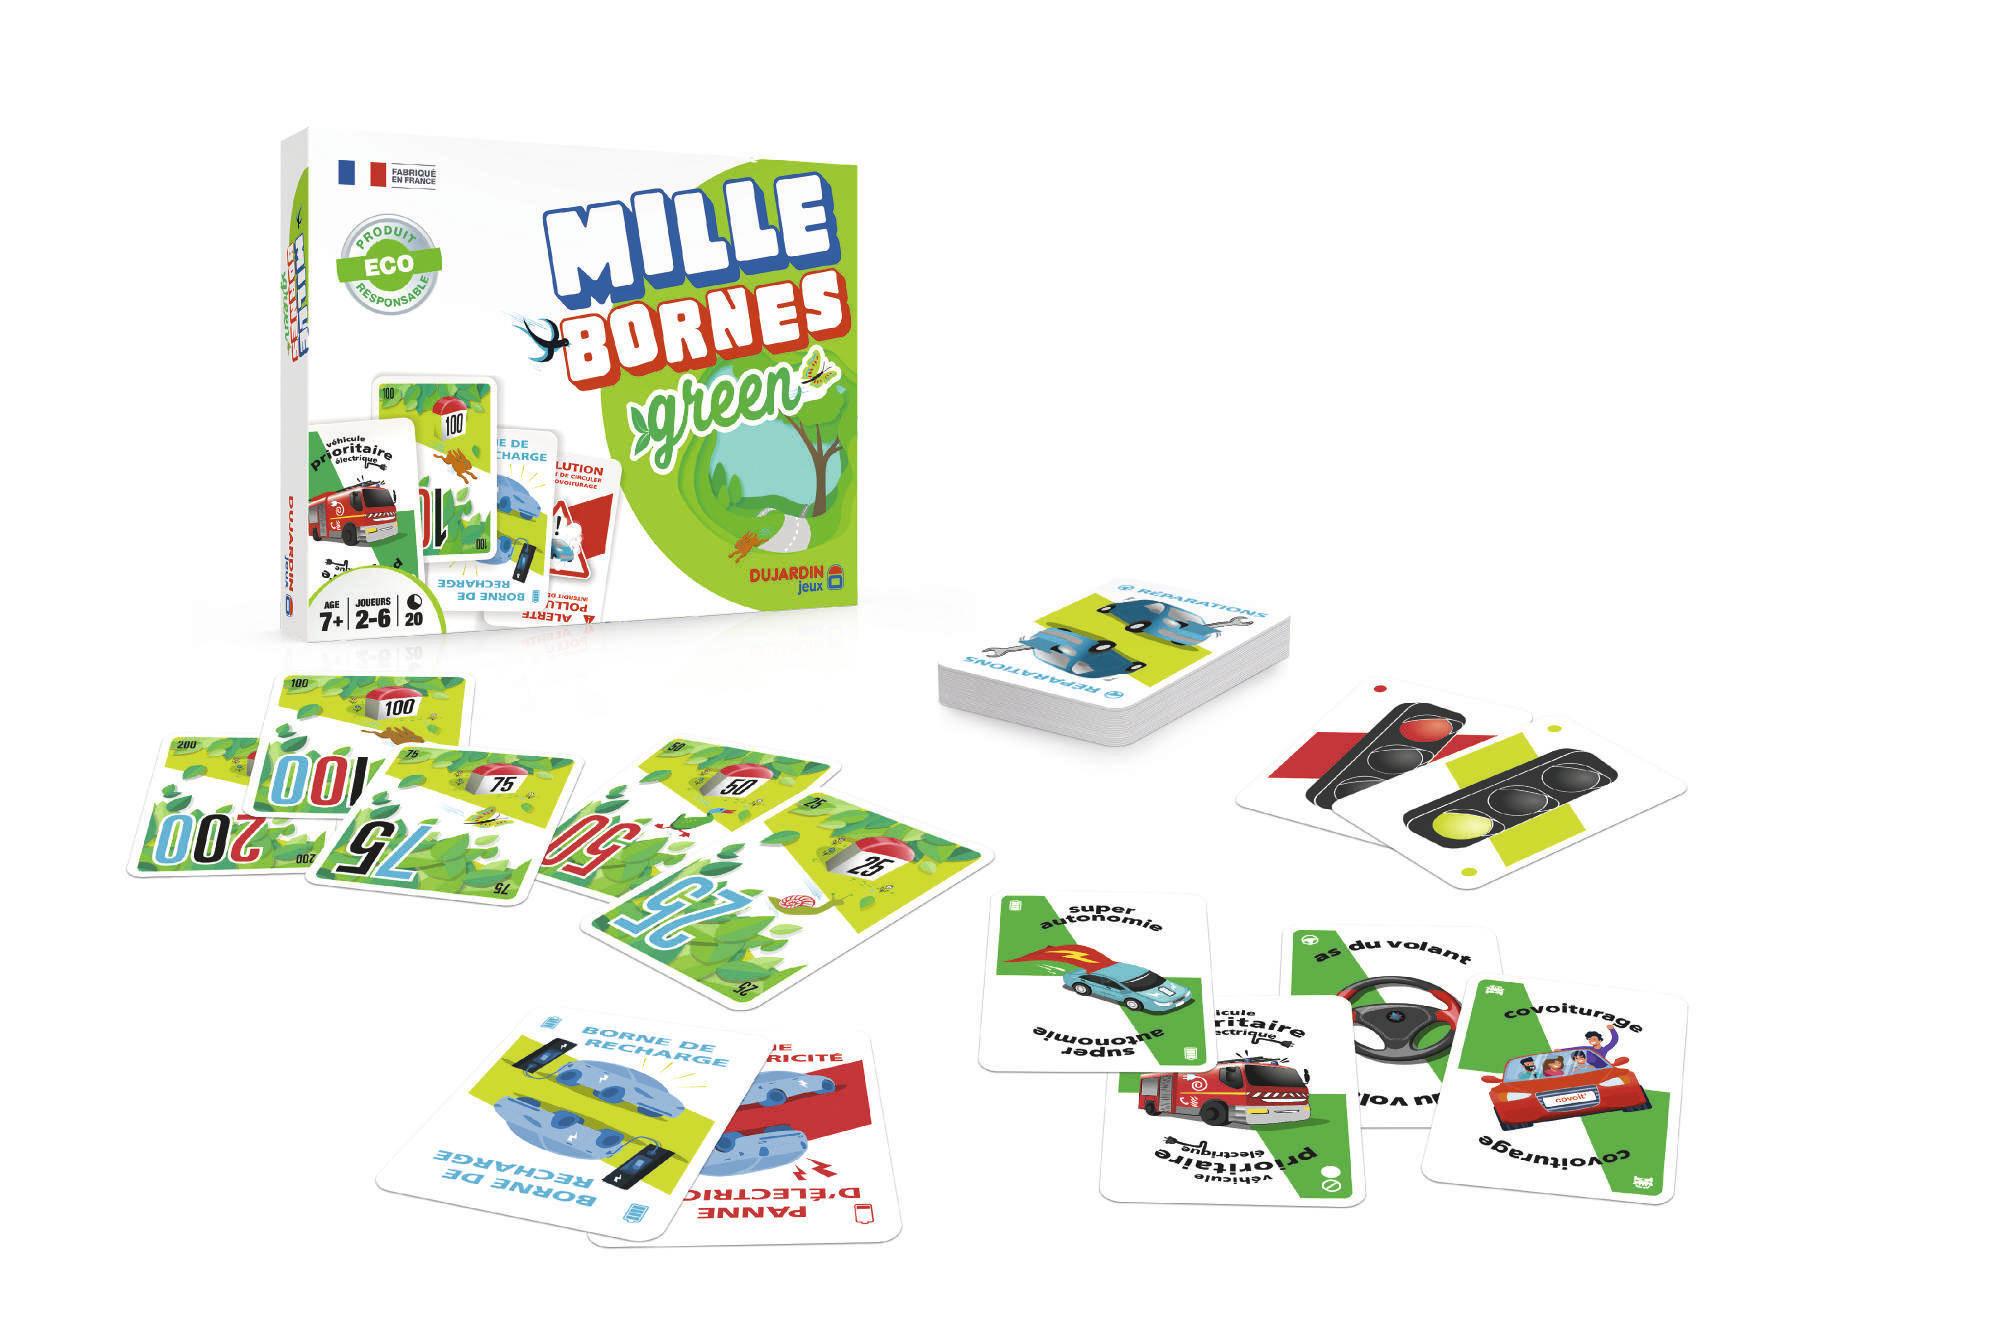 https://www.jeuxdujardin.fr/sites/dujardin/files/images/3262190590243_Green_pack%20avec%20contenu_BD_0.jpg